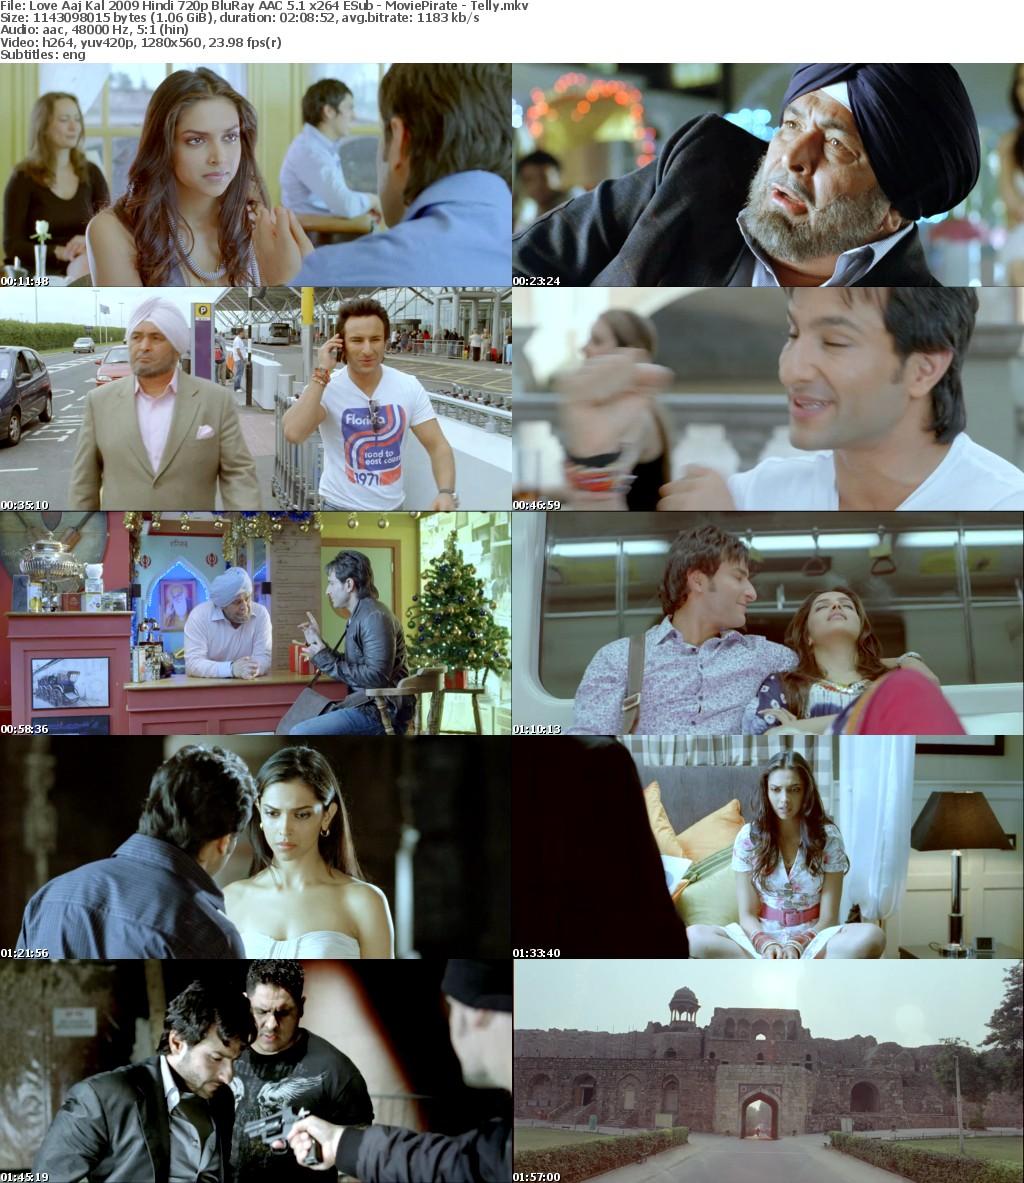 Love Aaj Kal 2009 Hindi 720p BluRay AAC 5 1 x264 ESub - MoviePirate - Telly mkv